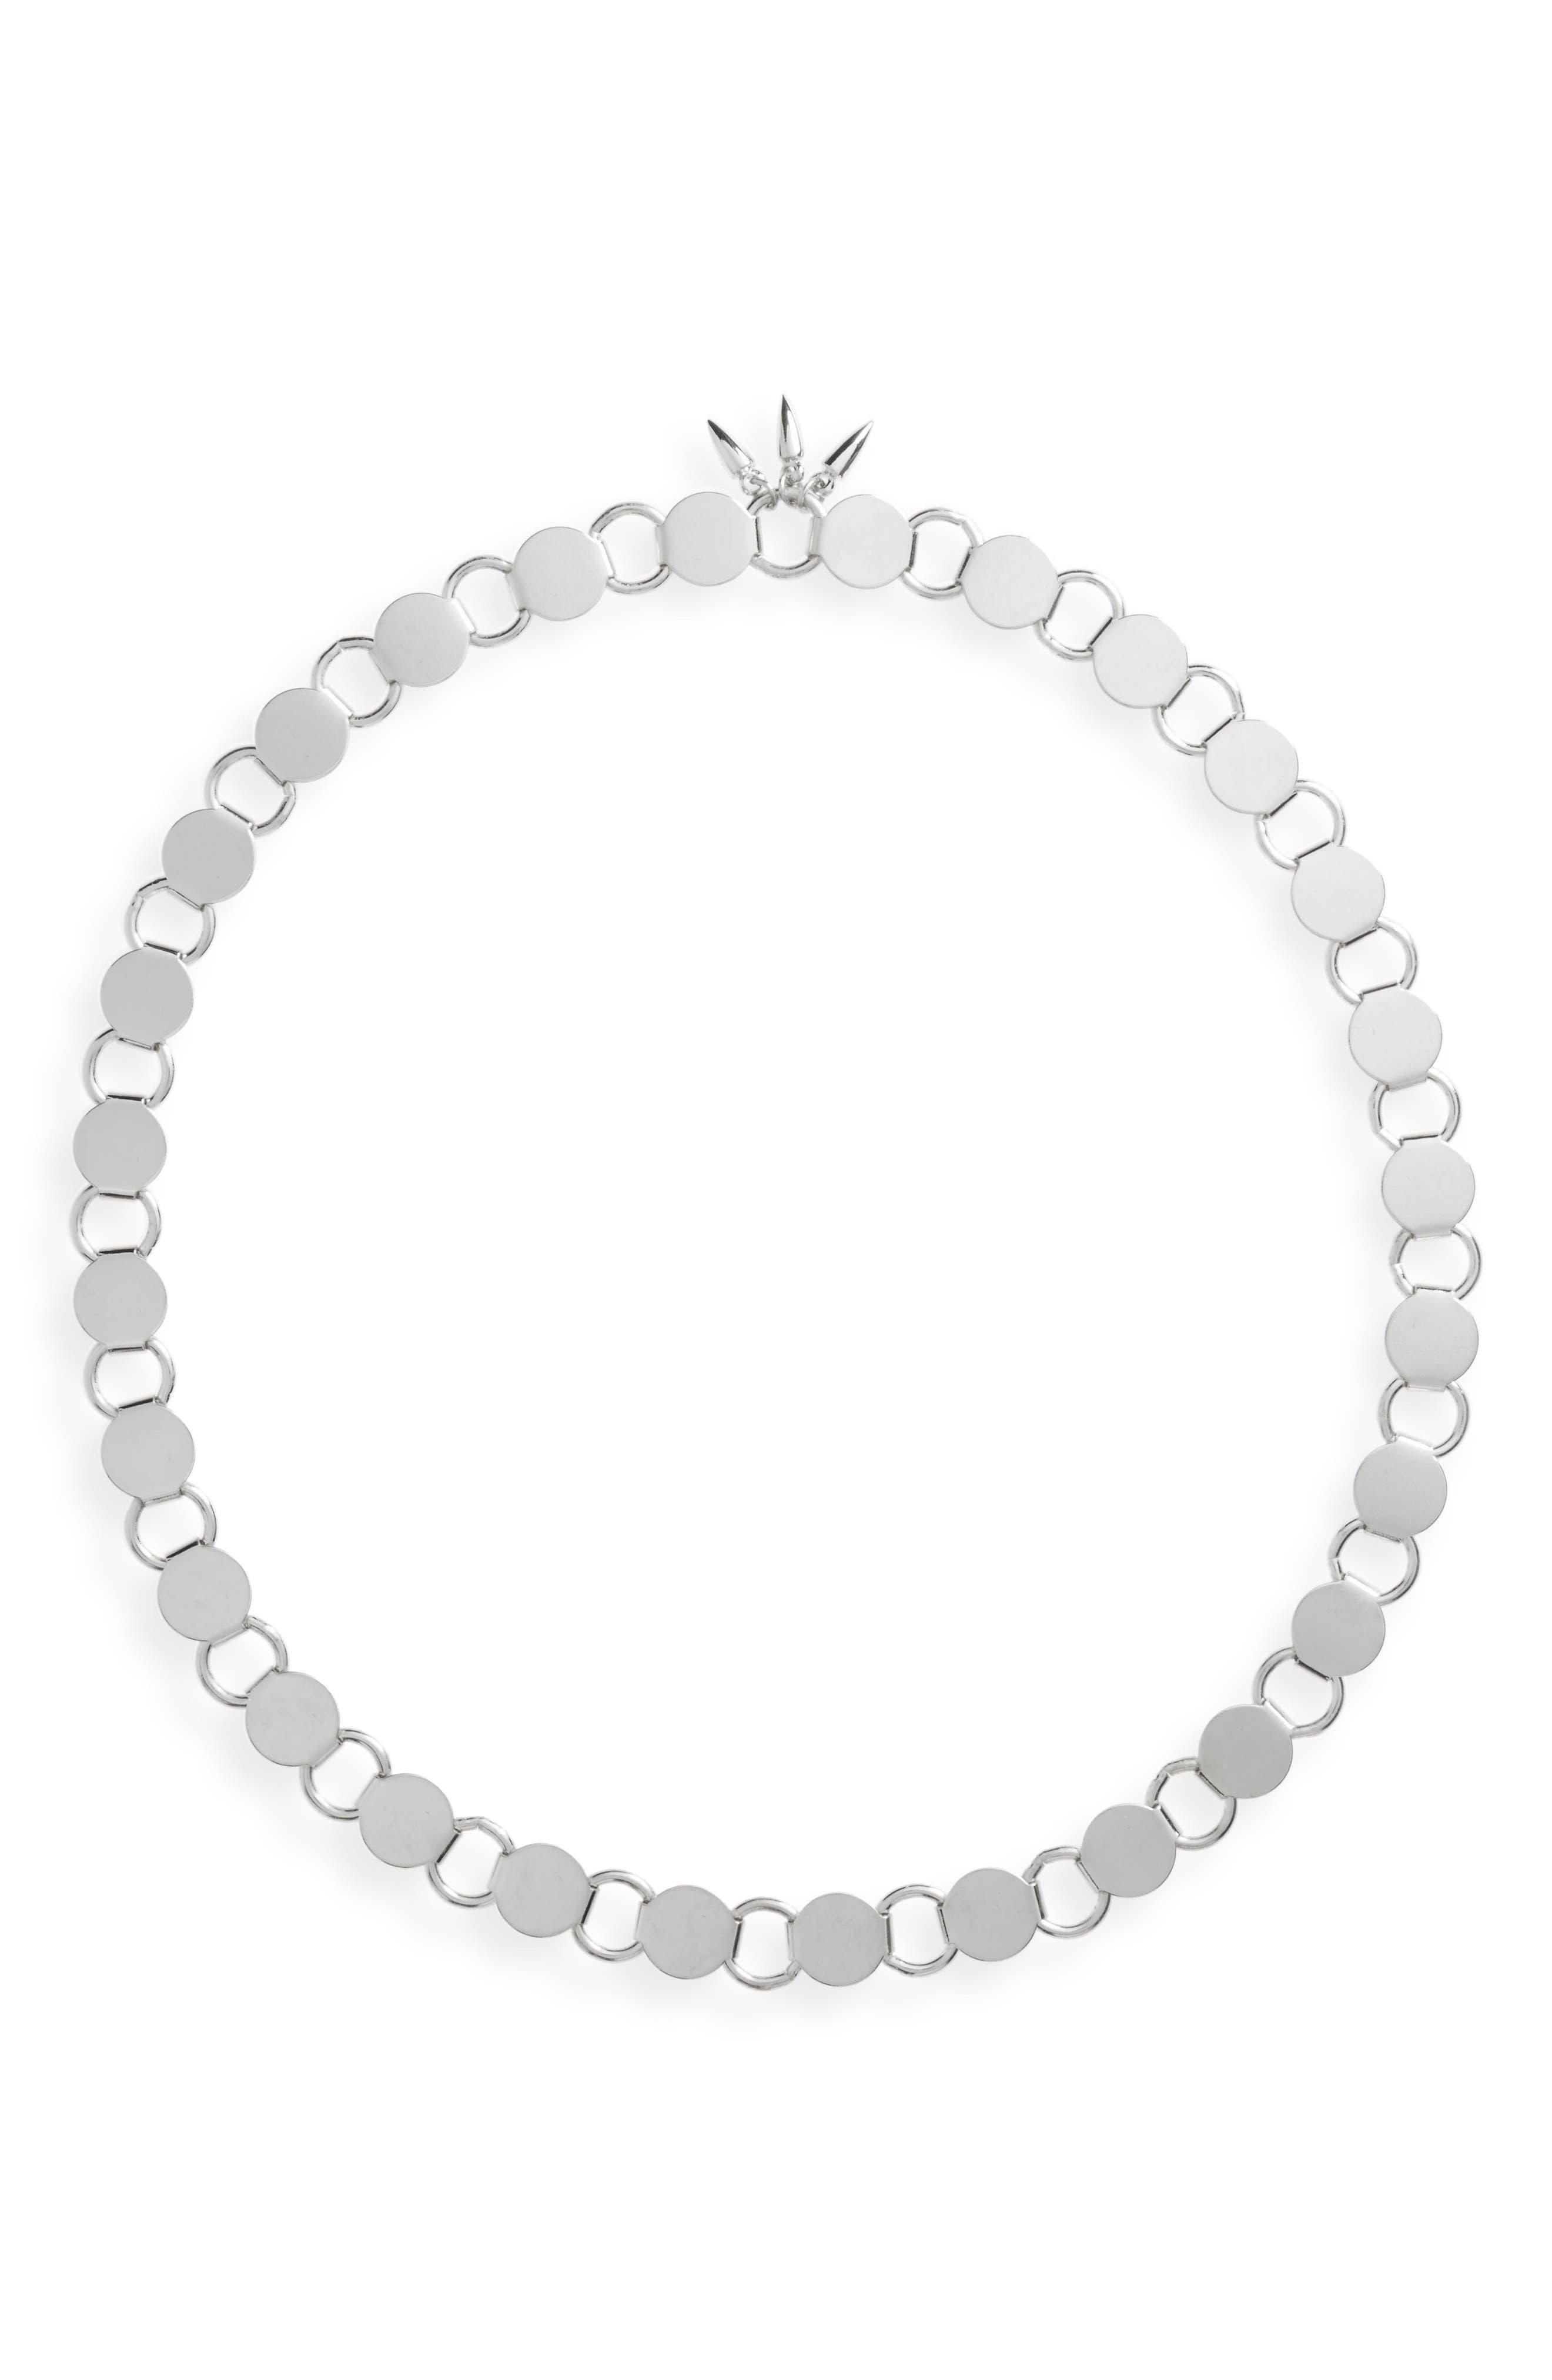 Alternate Image 1 Selected - BIKO Convertible Link Necklace